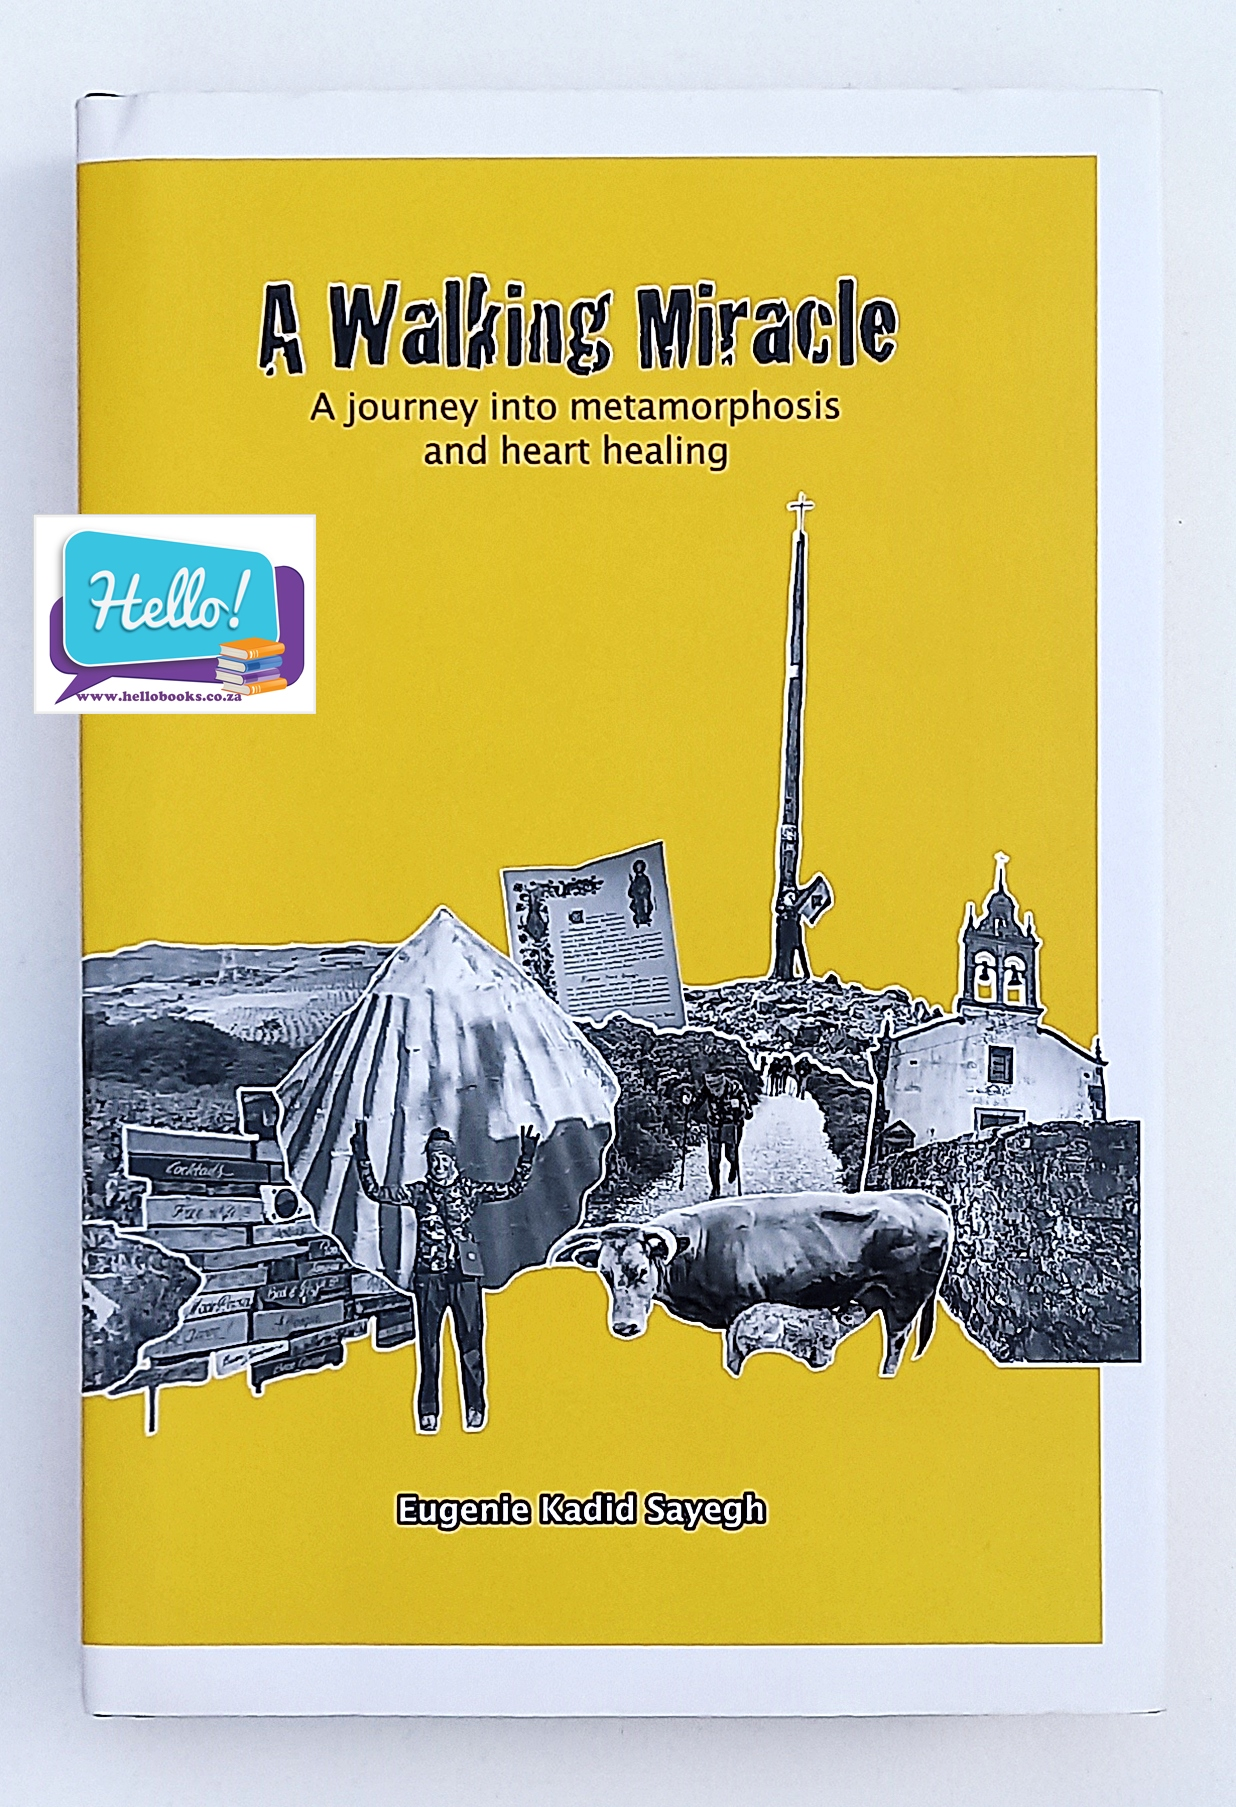 Eugenie Kadid Sayegh A Walking Miracle